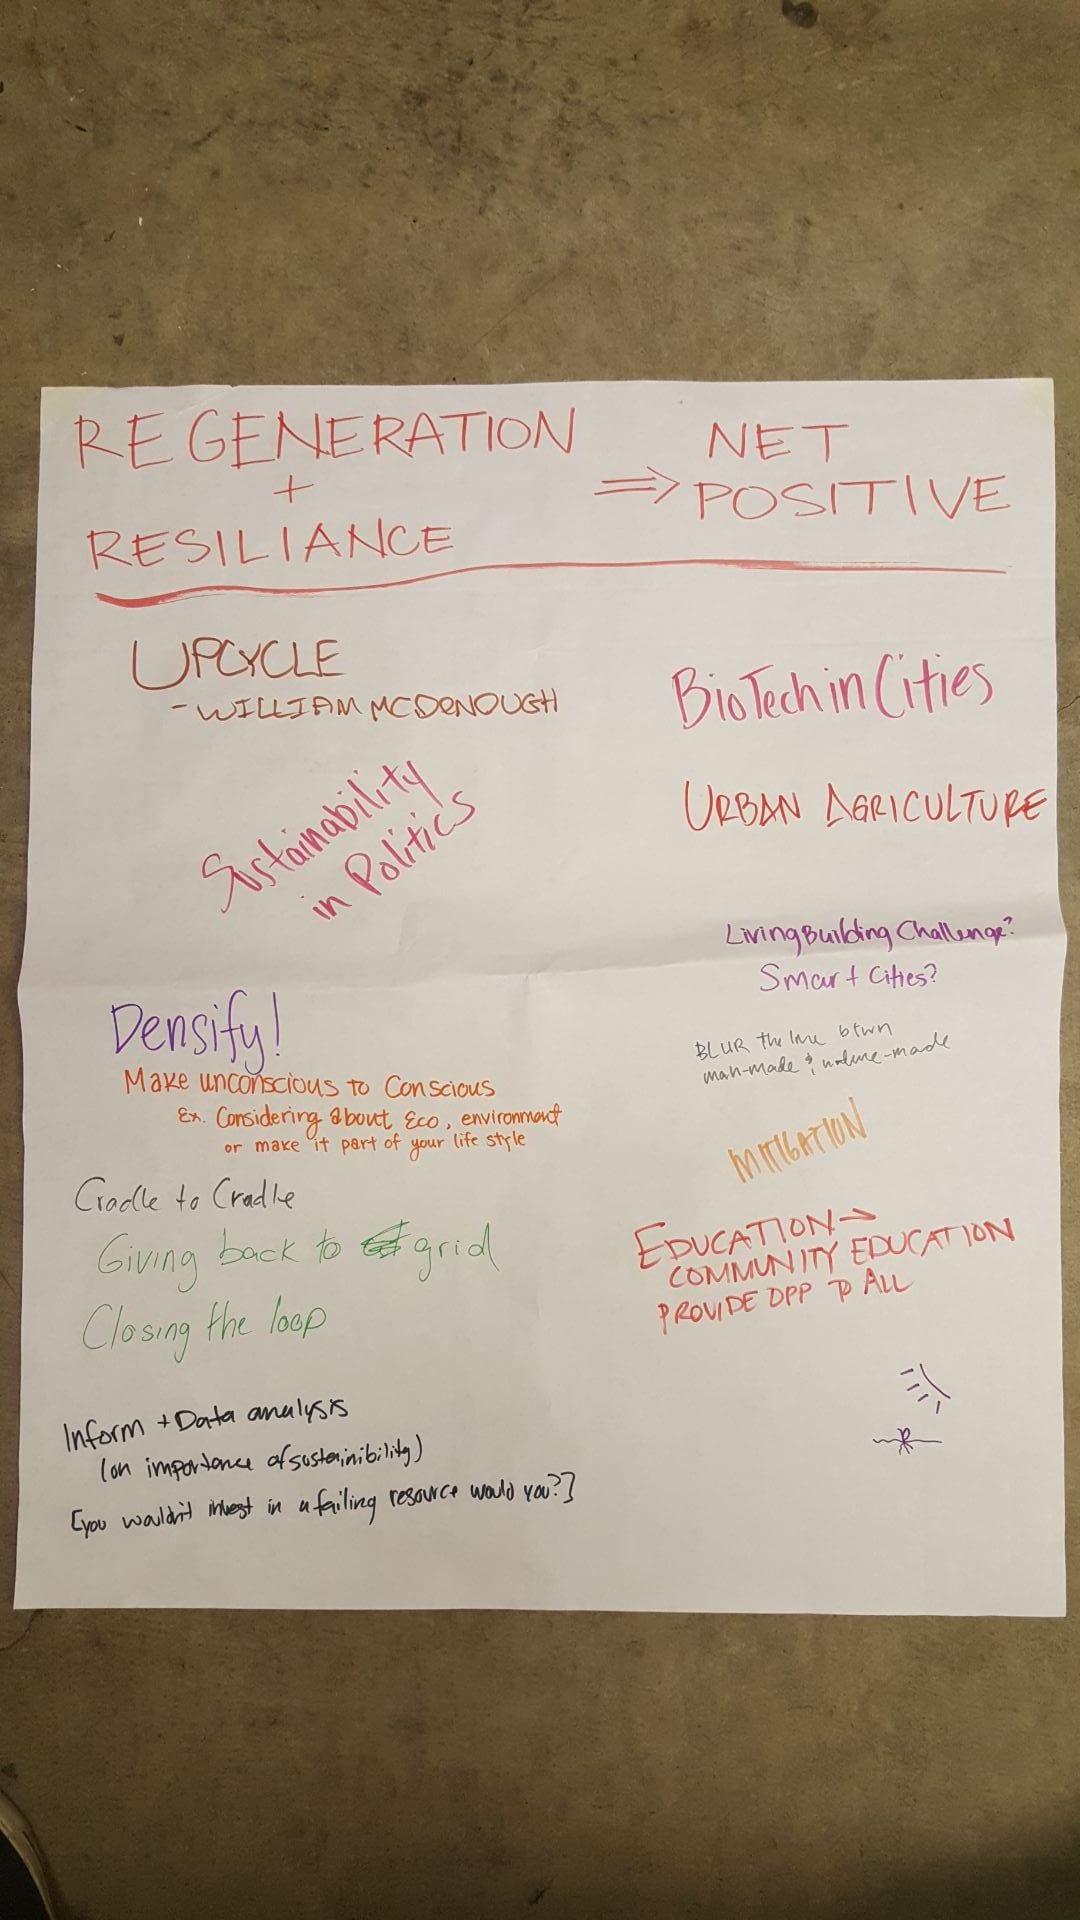 Regeneration, Resilience, Net Positive-2ojap0d